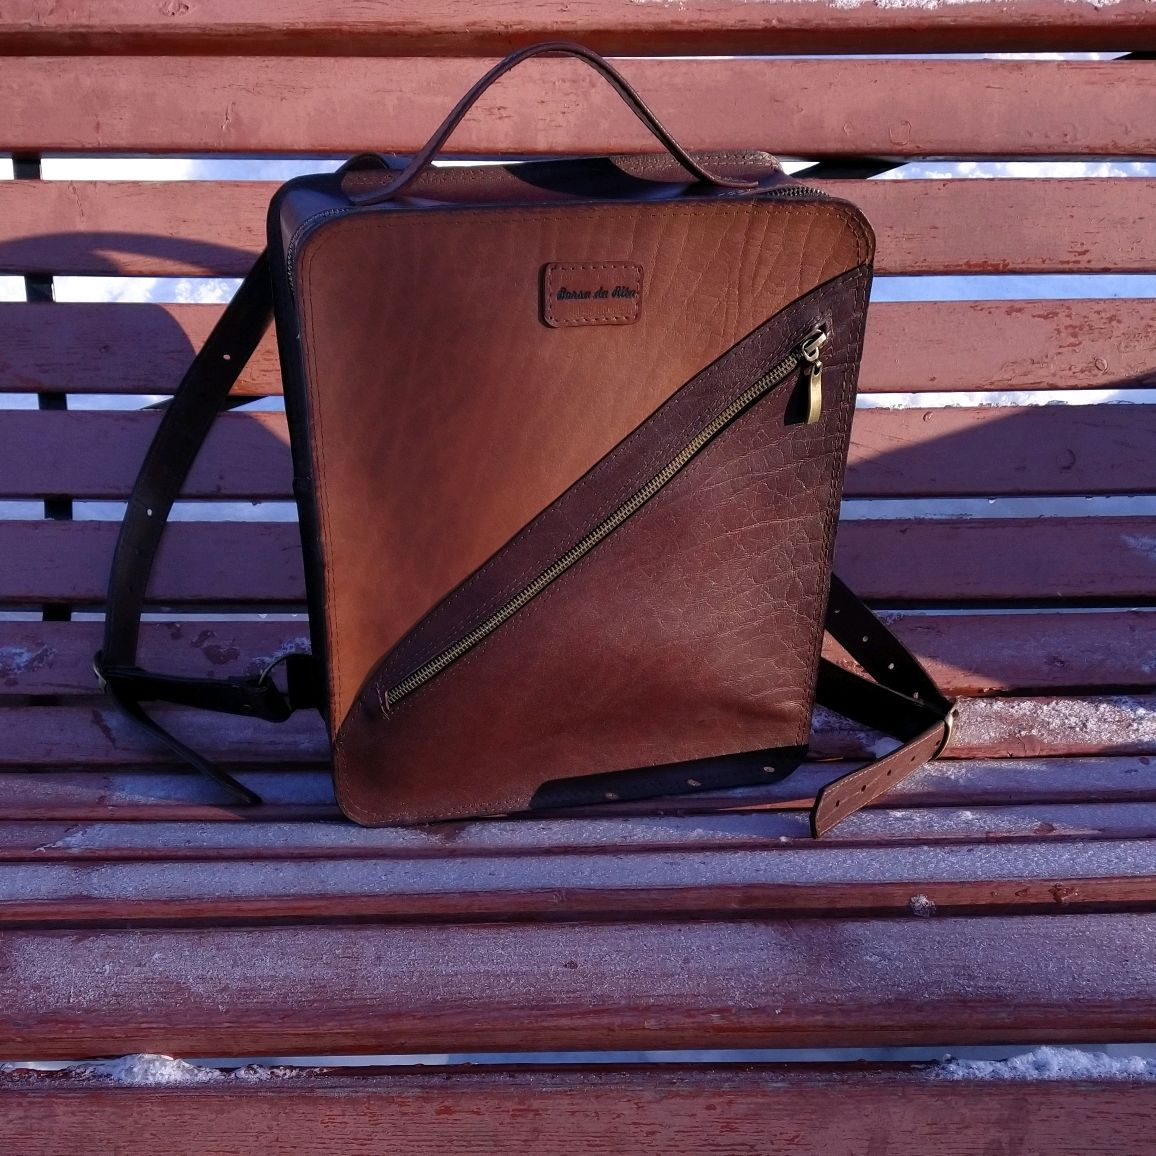 Рюкзак кожаный Borsa da Rita, Рюкзаки, Мурманск,  Фото №1